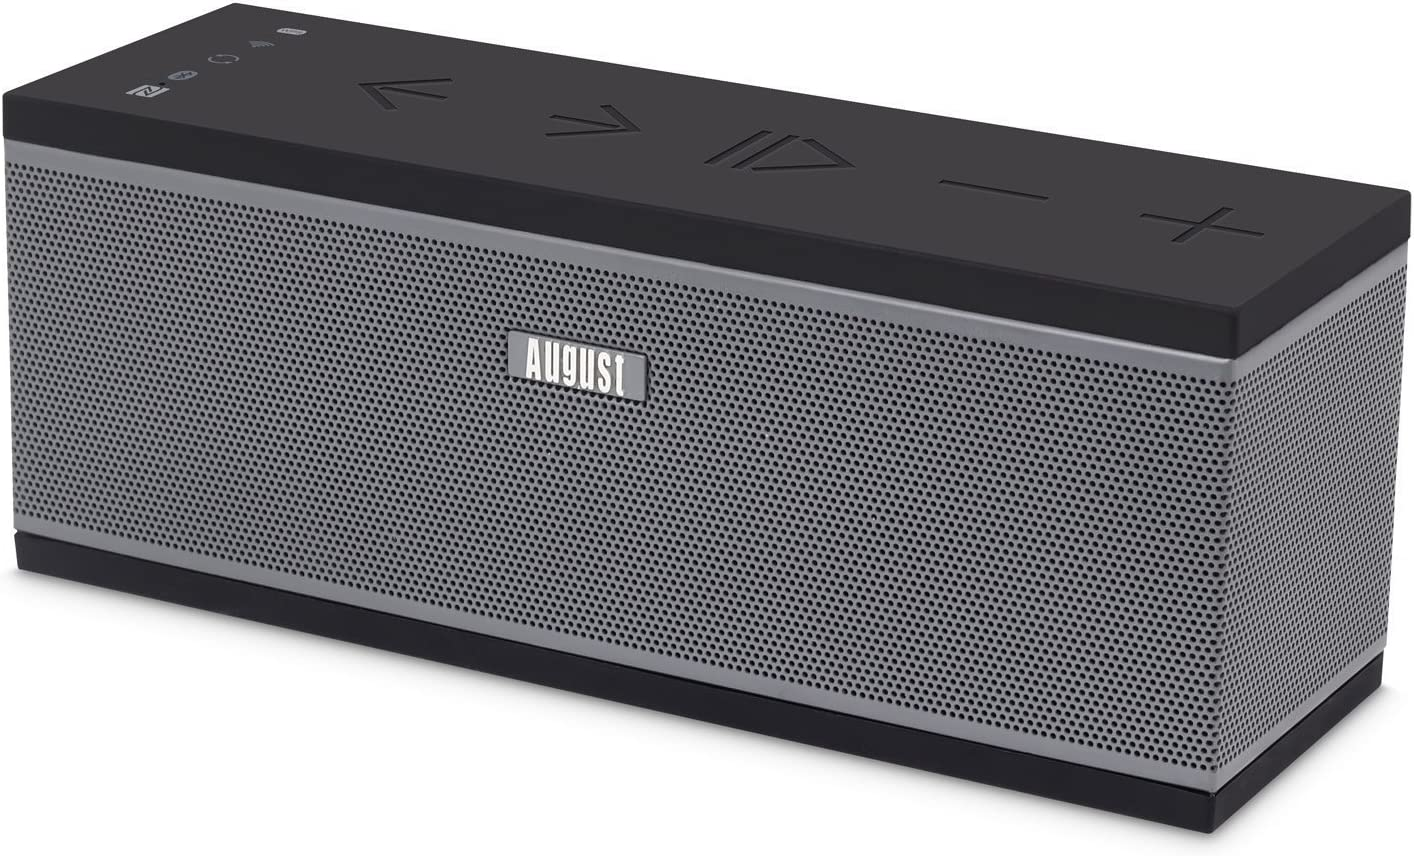 Altavoz inalámbrico multiroom Wi-Fi - August WS300G - 15 W (Wi-Fi/Airplay/Bluetooth/USB)